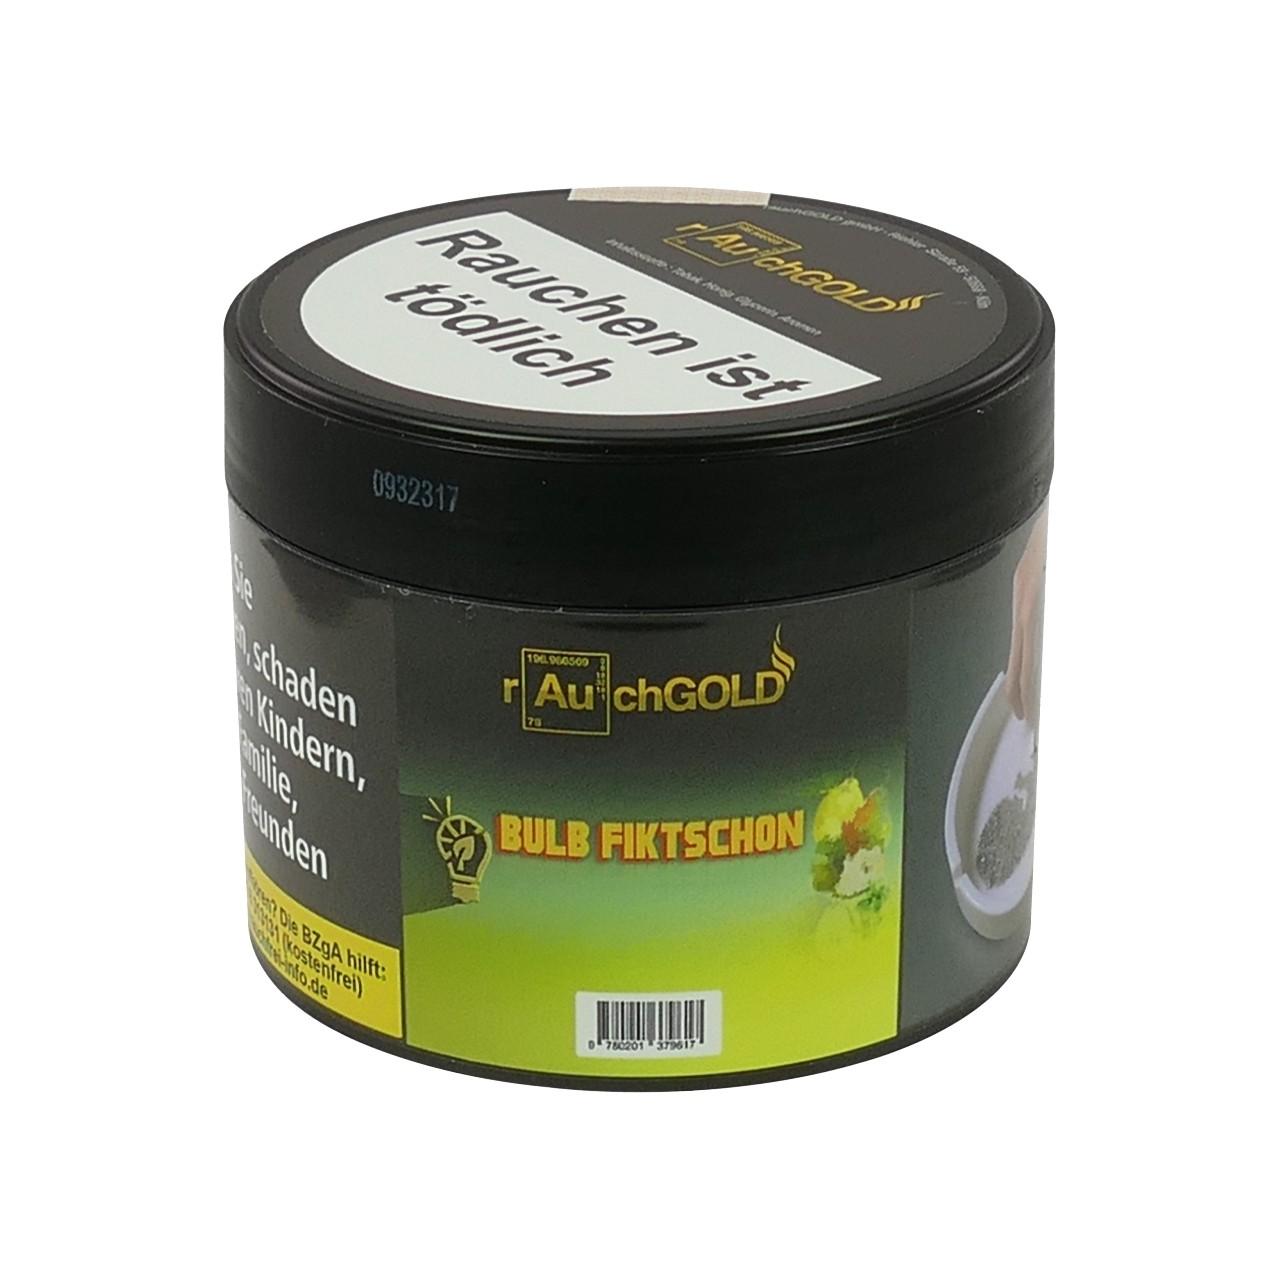 Rauchgold Zitronenbonbon Birne Minze (Bulb Fiktschon) Shisha Tabak, 200g